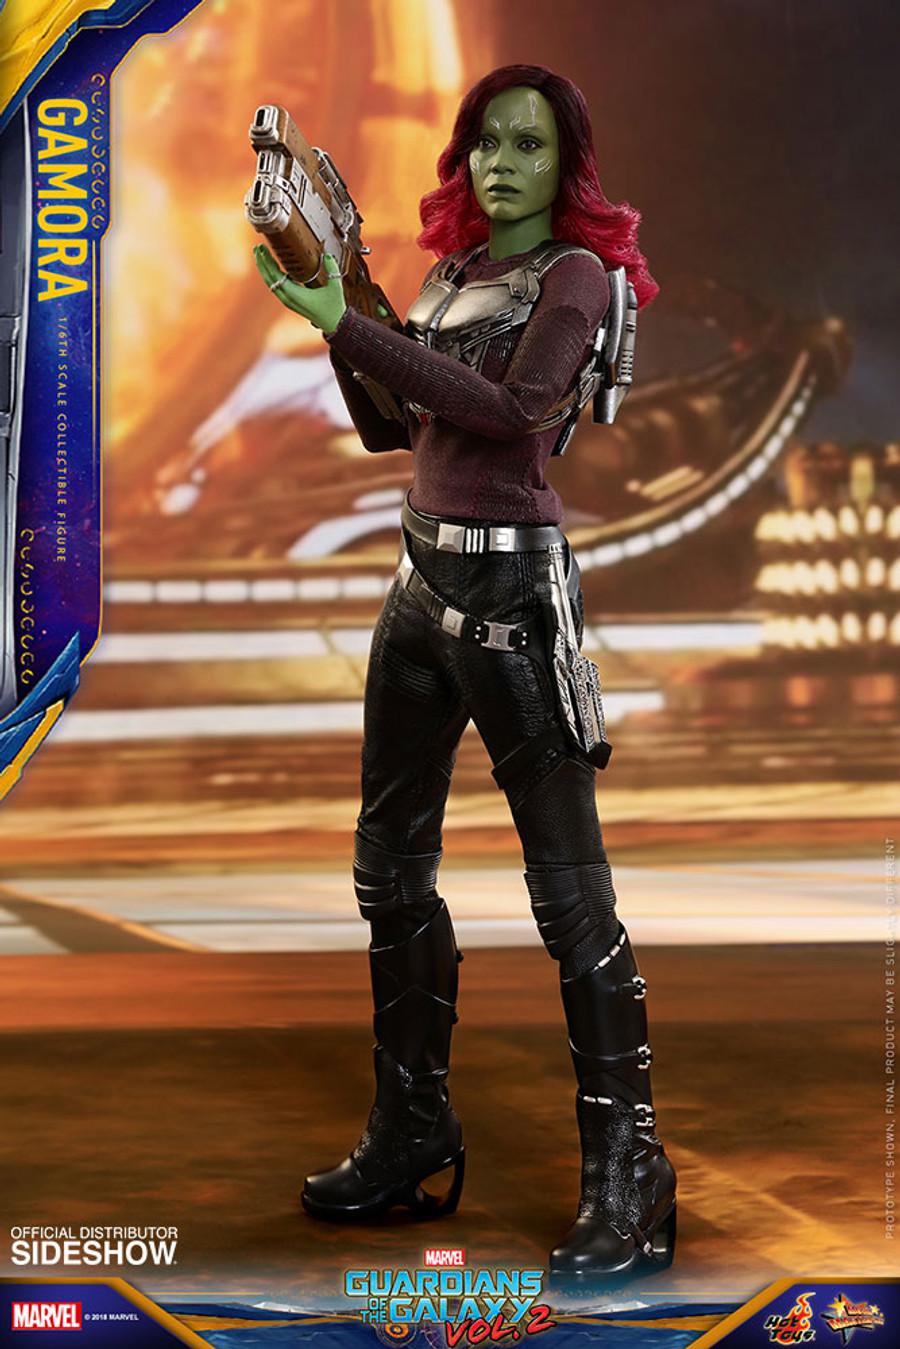 Hot Toys - Guardians of the Galaxy Vol 2 - Gamora